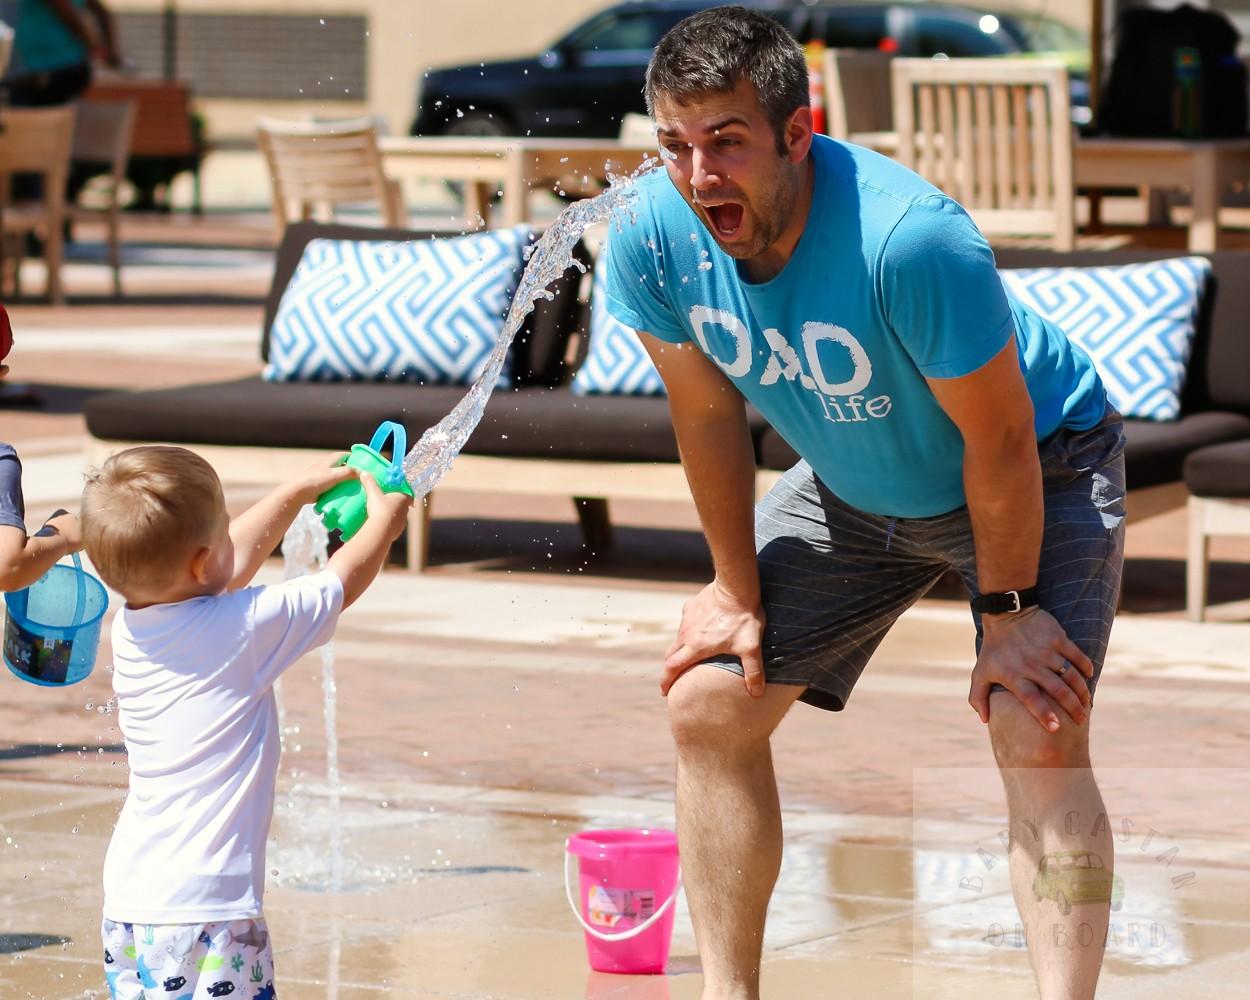 best splash pads in DC_One Loudoun Splash pad_toddler and dad_web